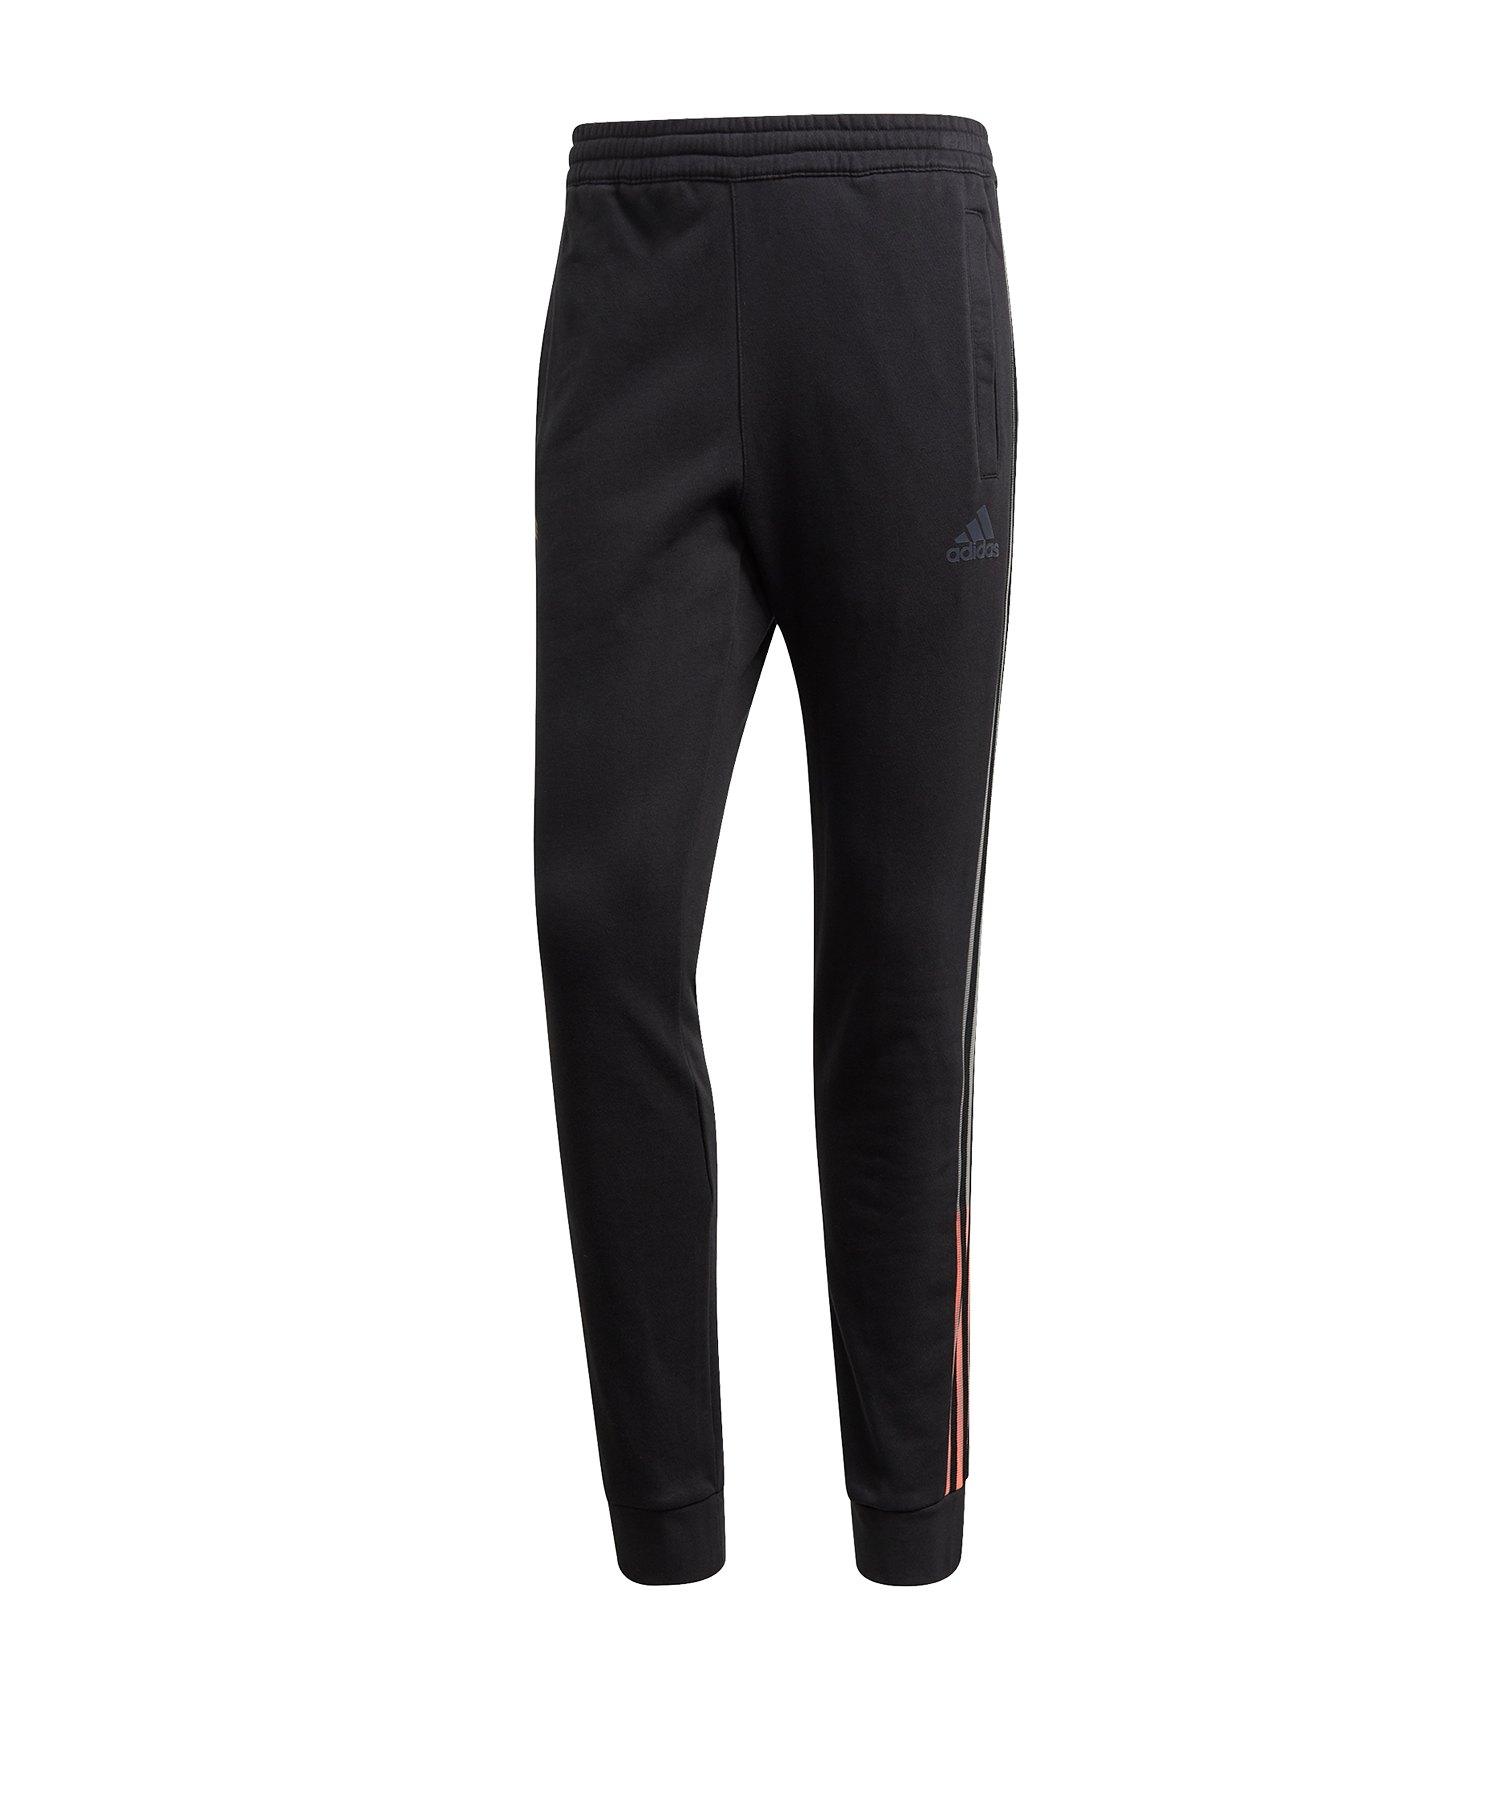 adidas Tango Sweat Jogginghose Schwarz - schwarz